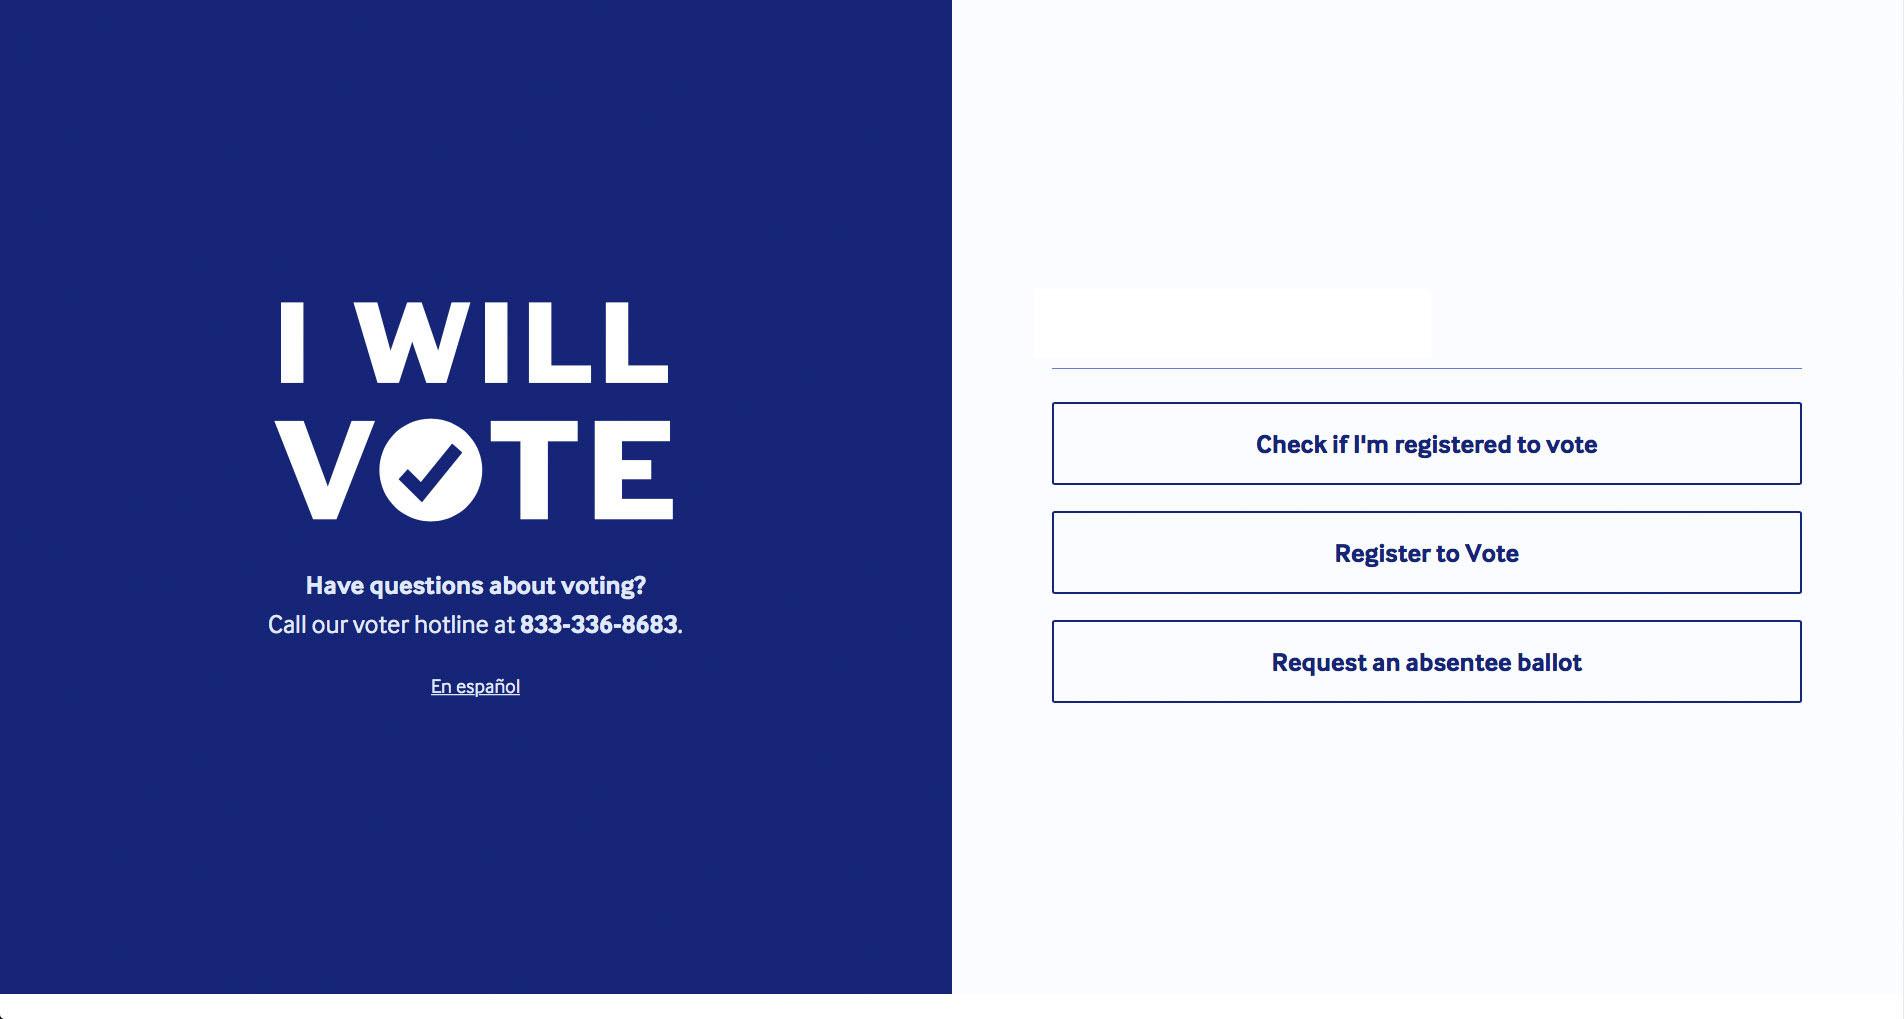 free professional resume check voter registration arizona